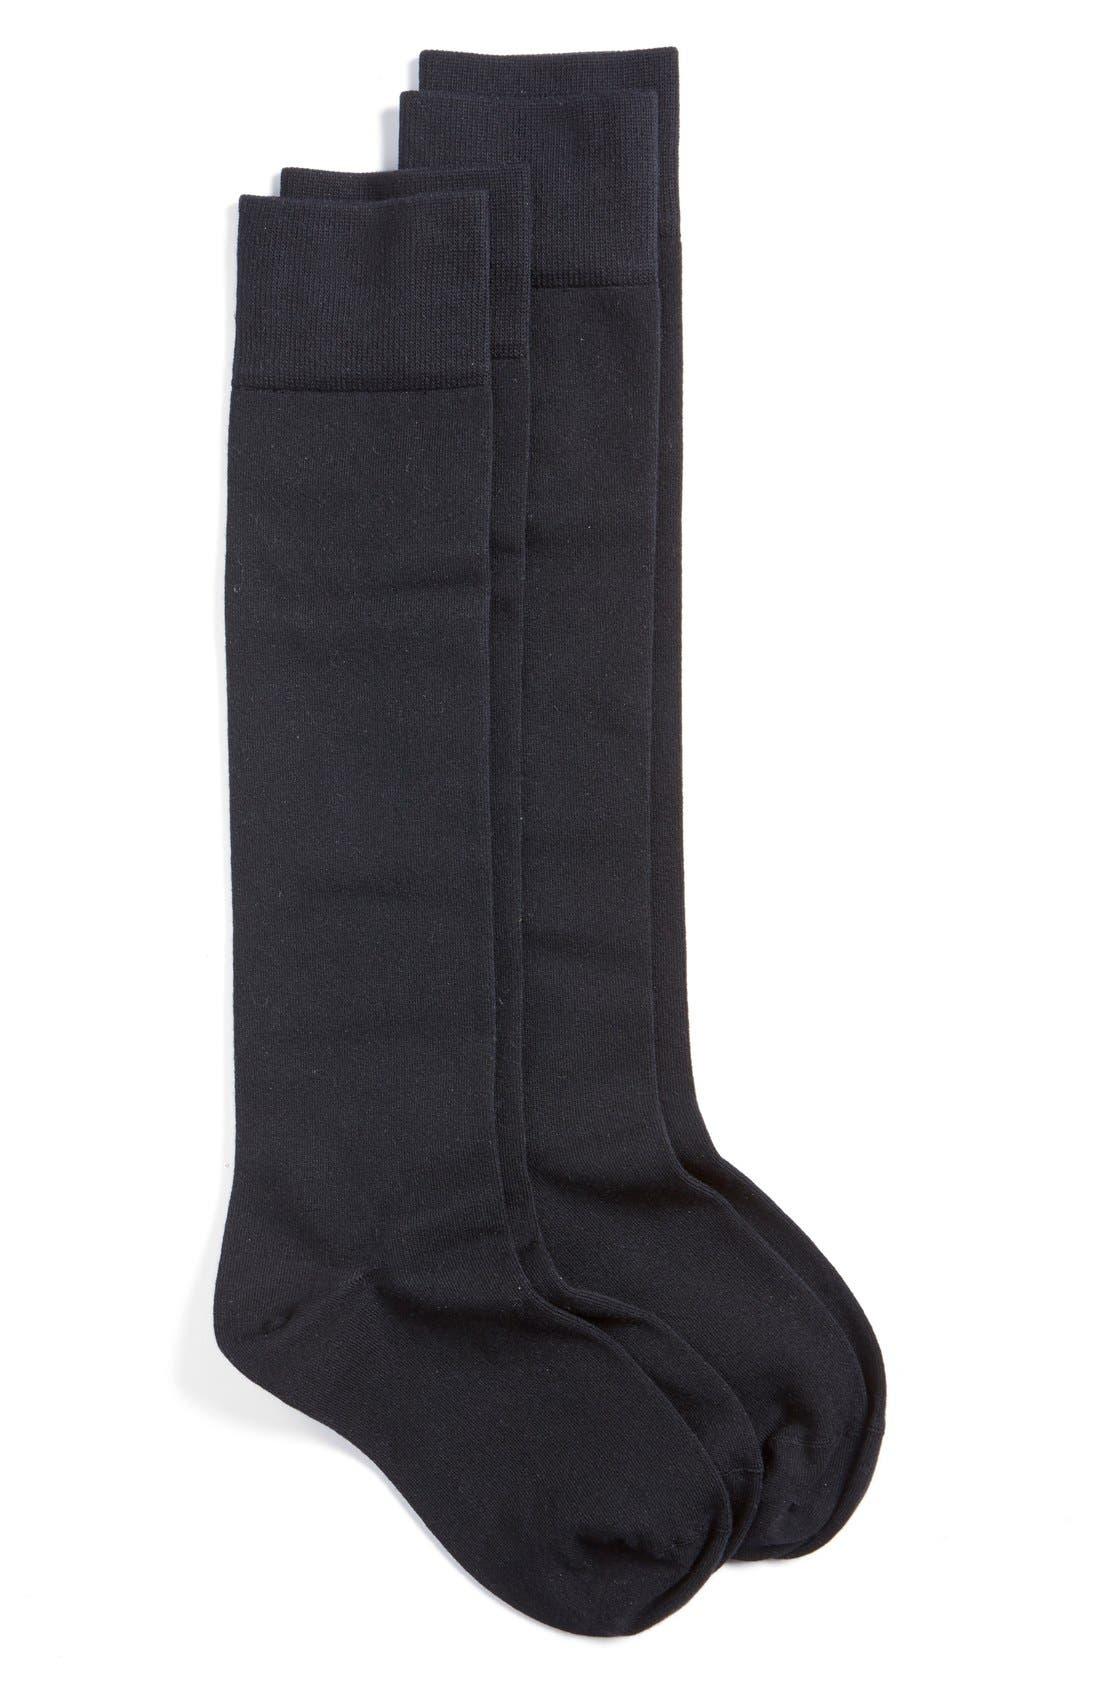 2-Pack Knee High Socks,                             Main thumbnail 1, color,                             Black